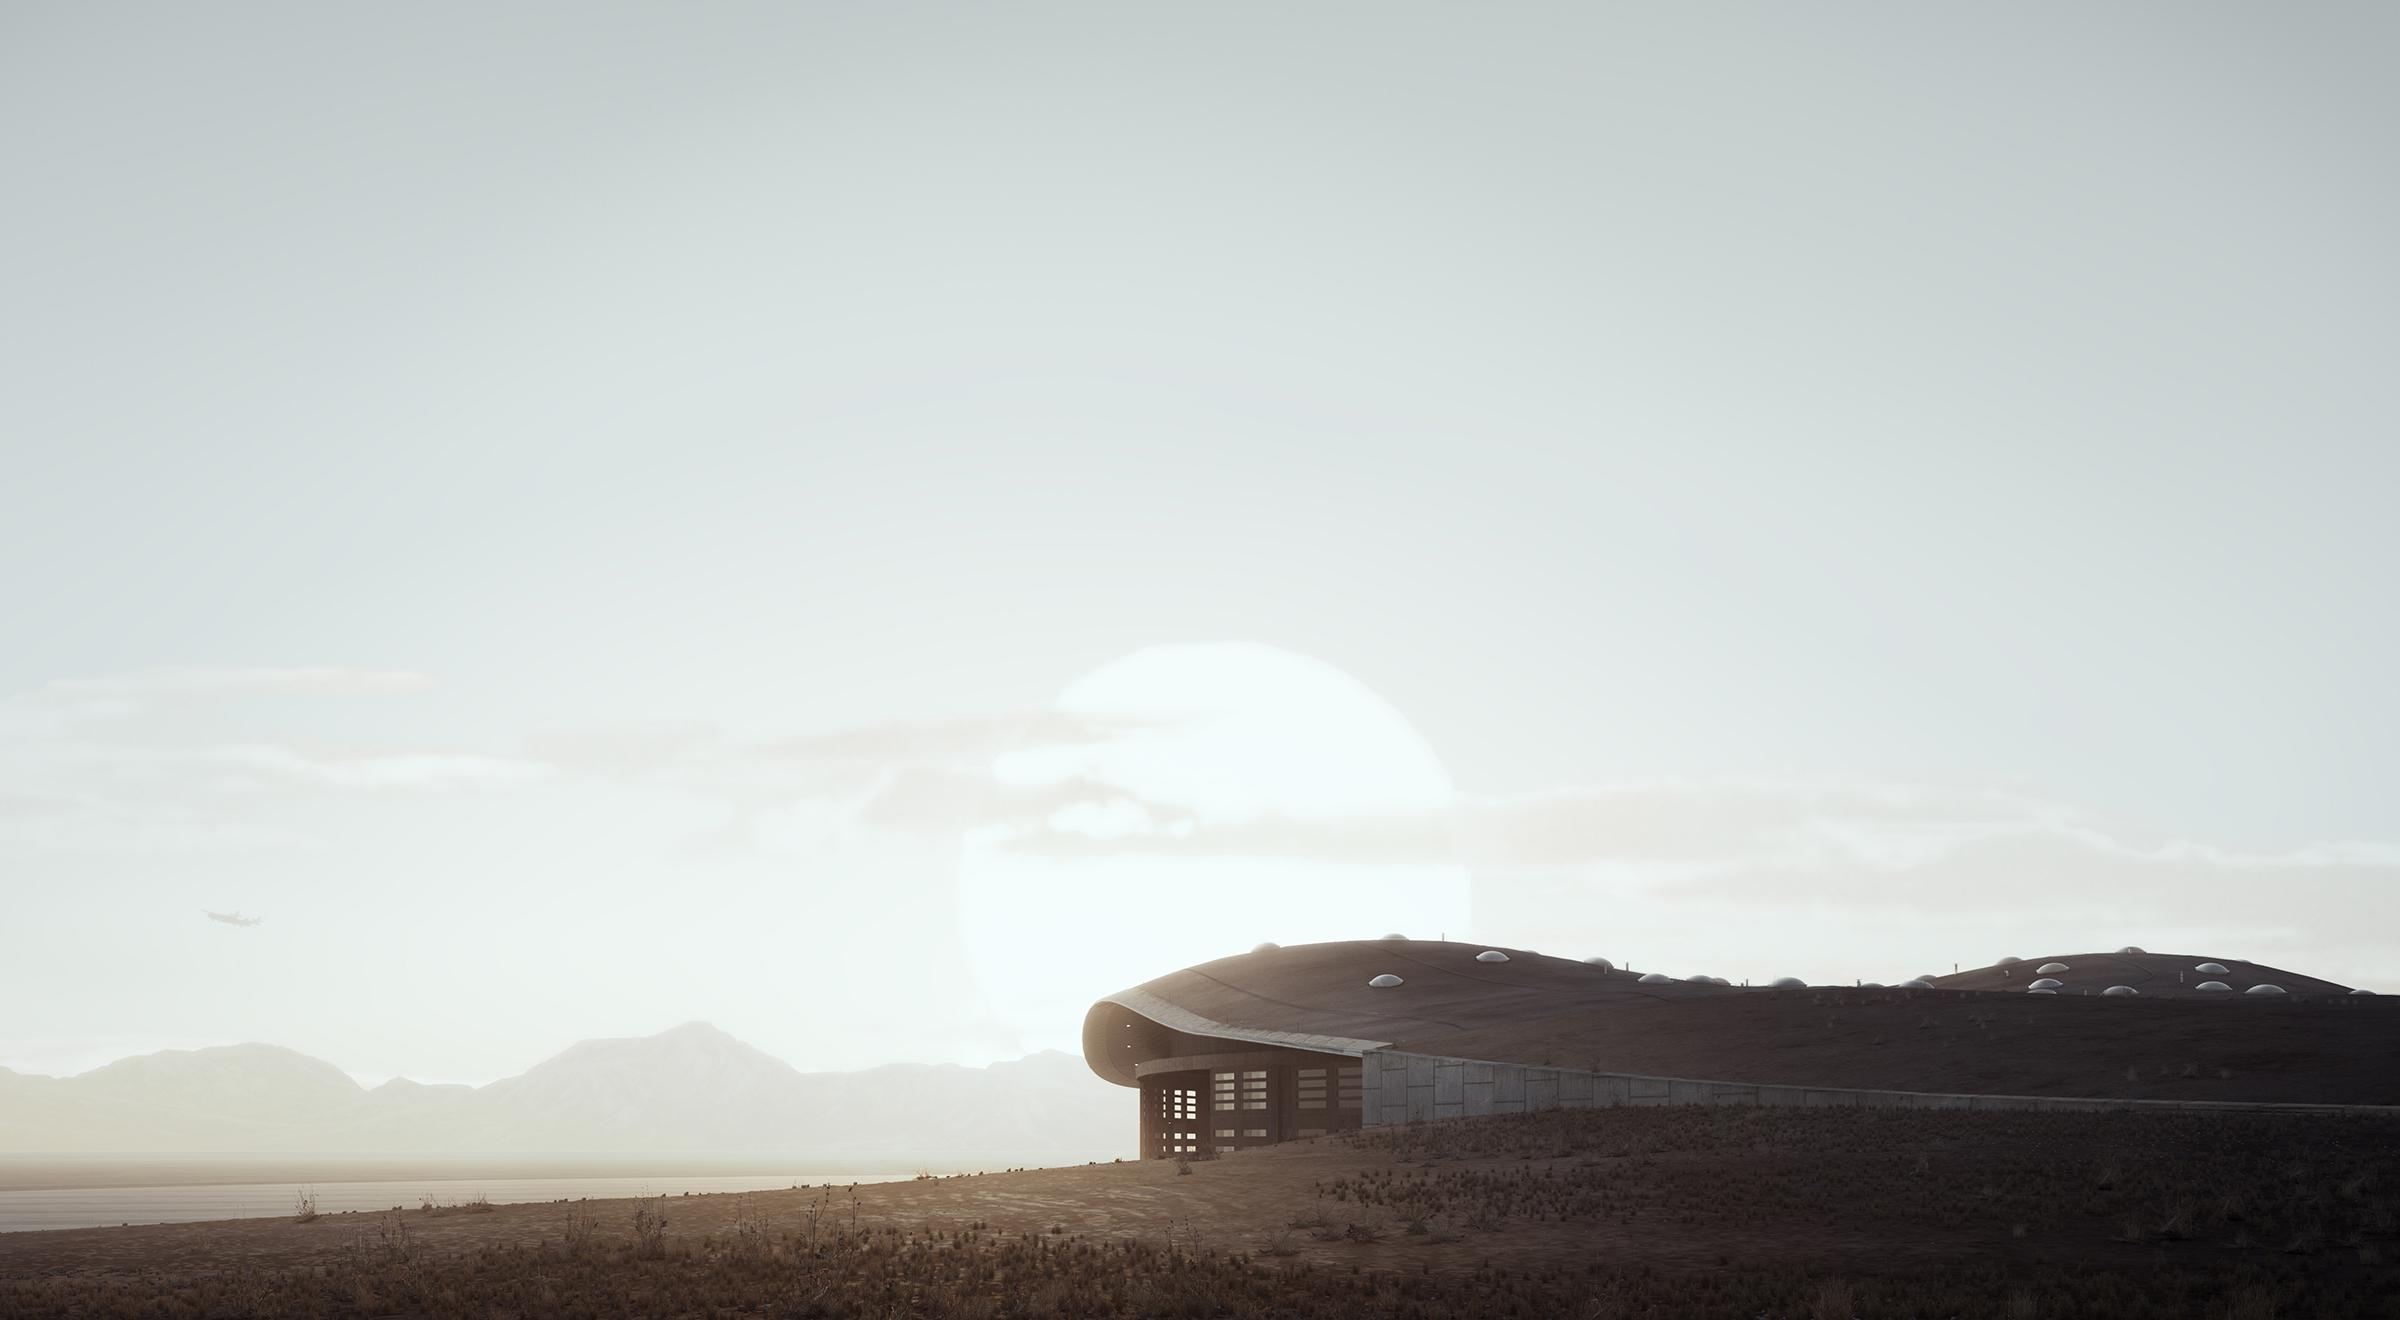 spaceport_dawn